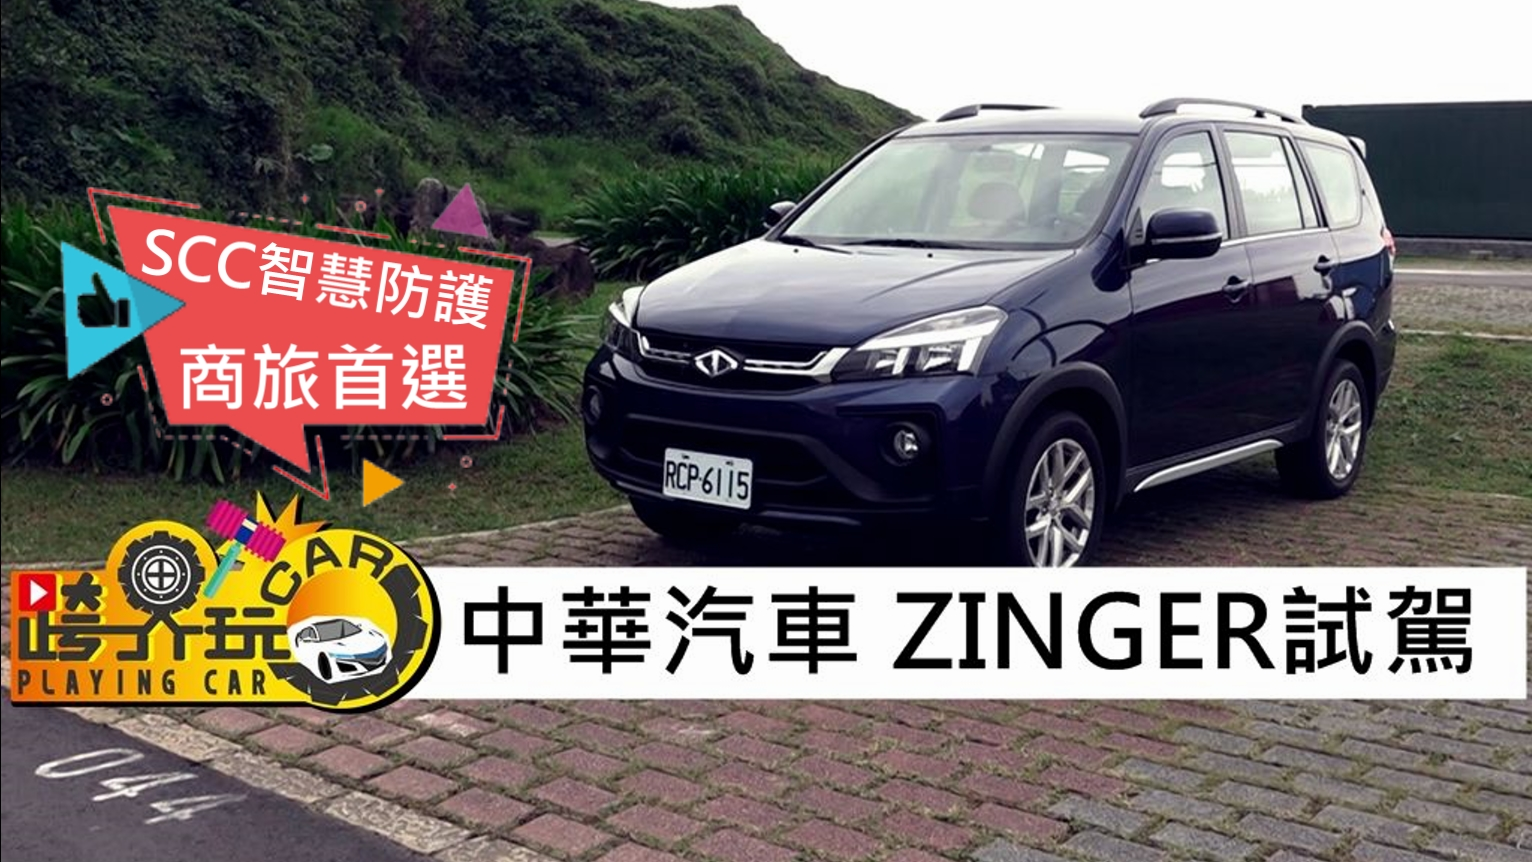 【跨界玩Car】中華全新ZINGER 試駕